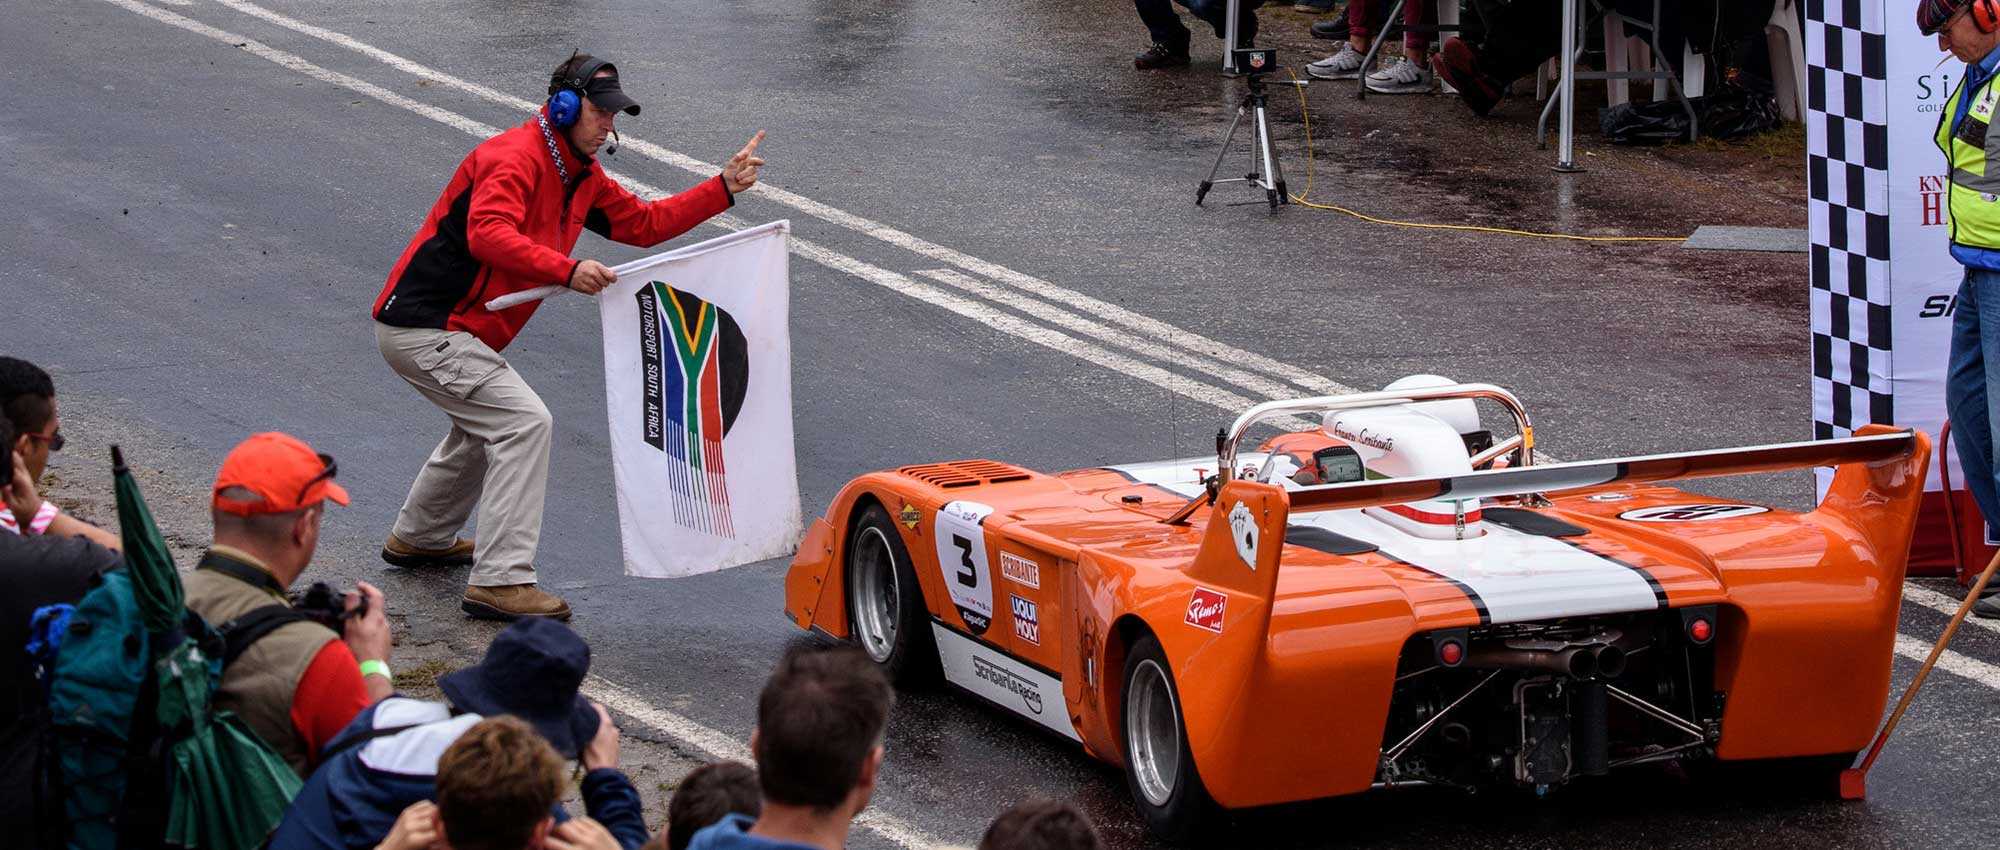 Franco-Scribante---1972-Chevron-B26---photo-Colin-Mileman---3